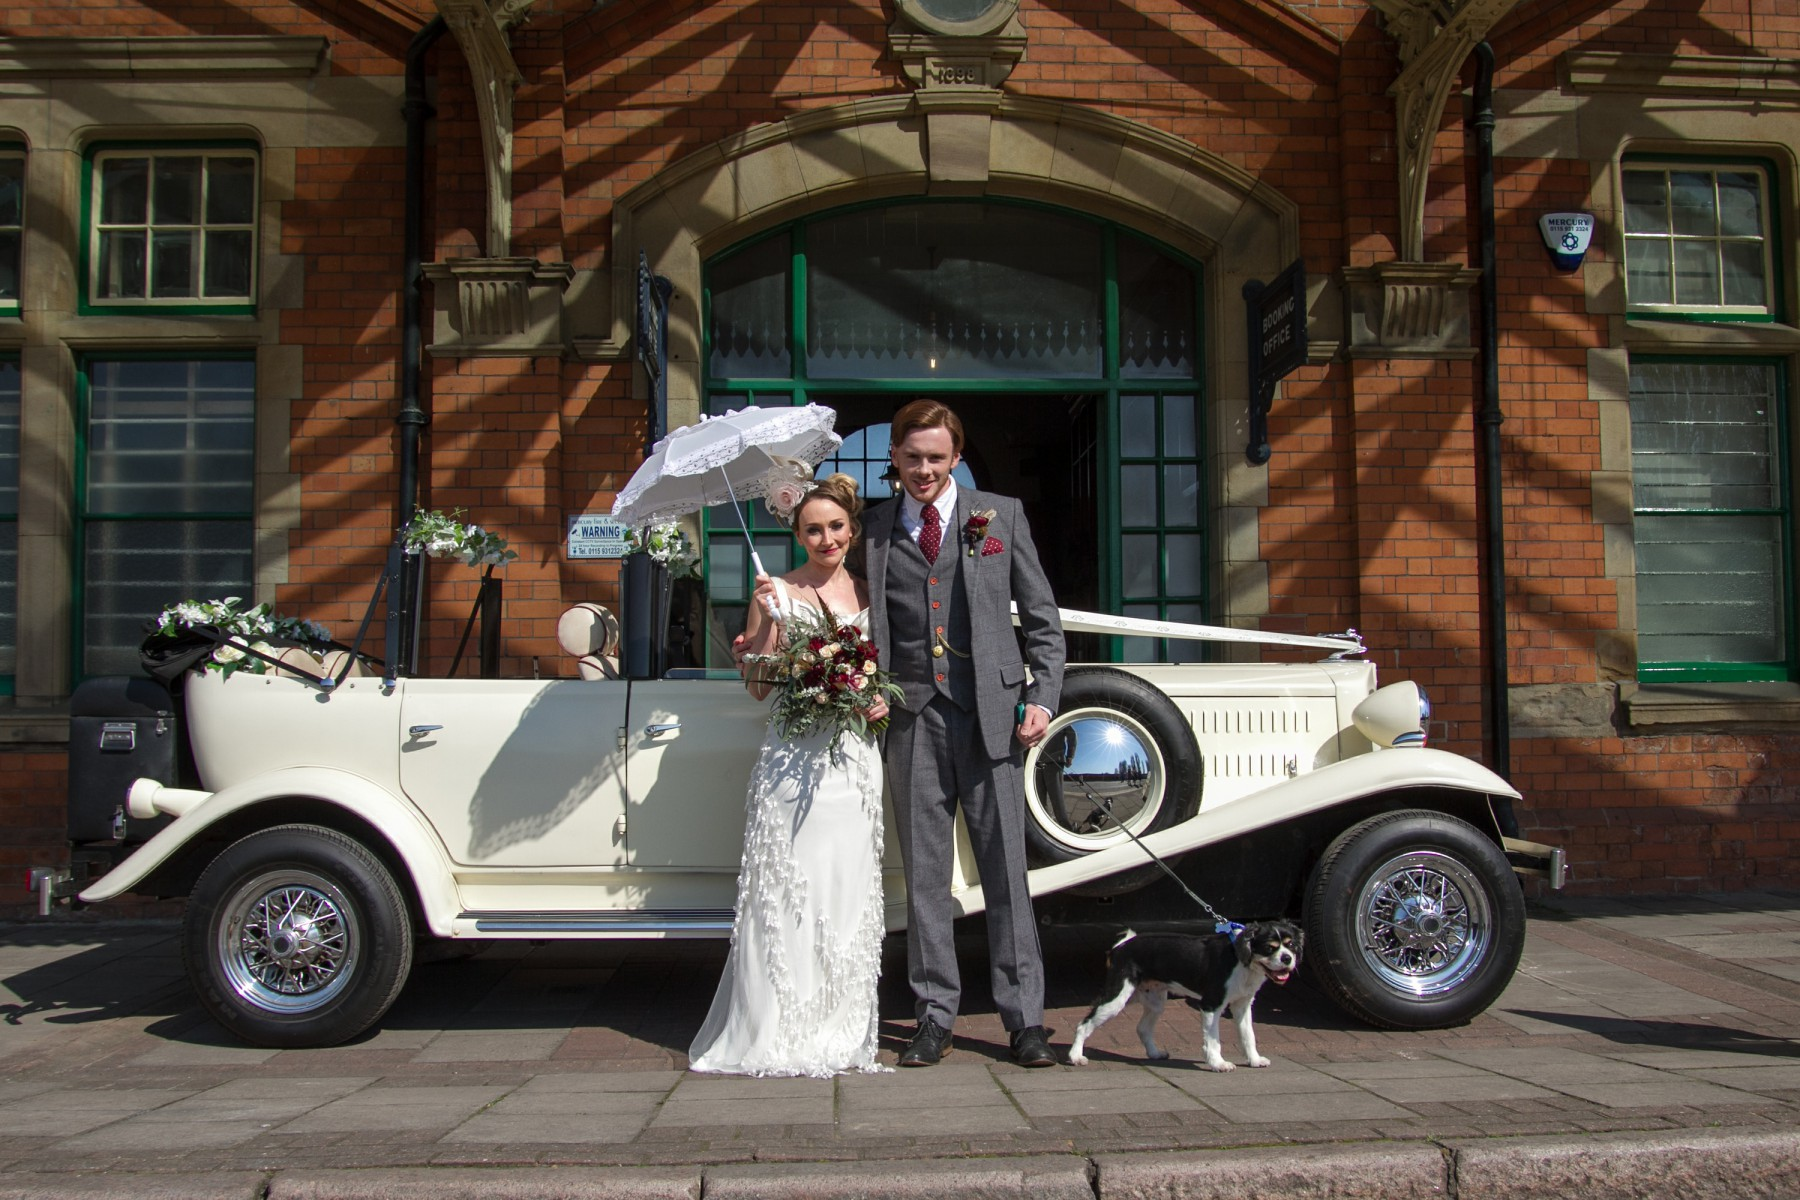 Iso Elegant Photography - Leicester wedding network - Railway wedding - vintage wedding 40